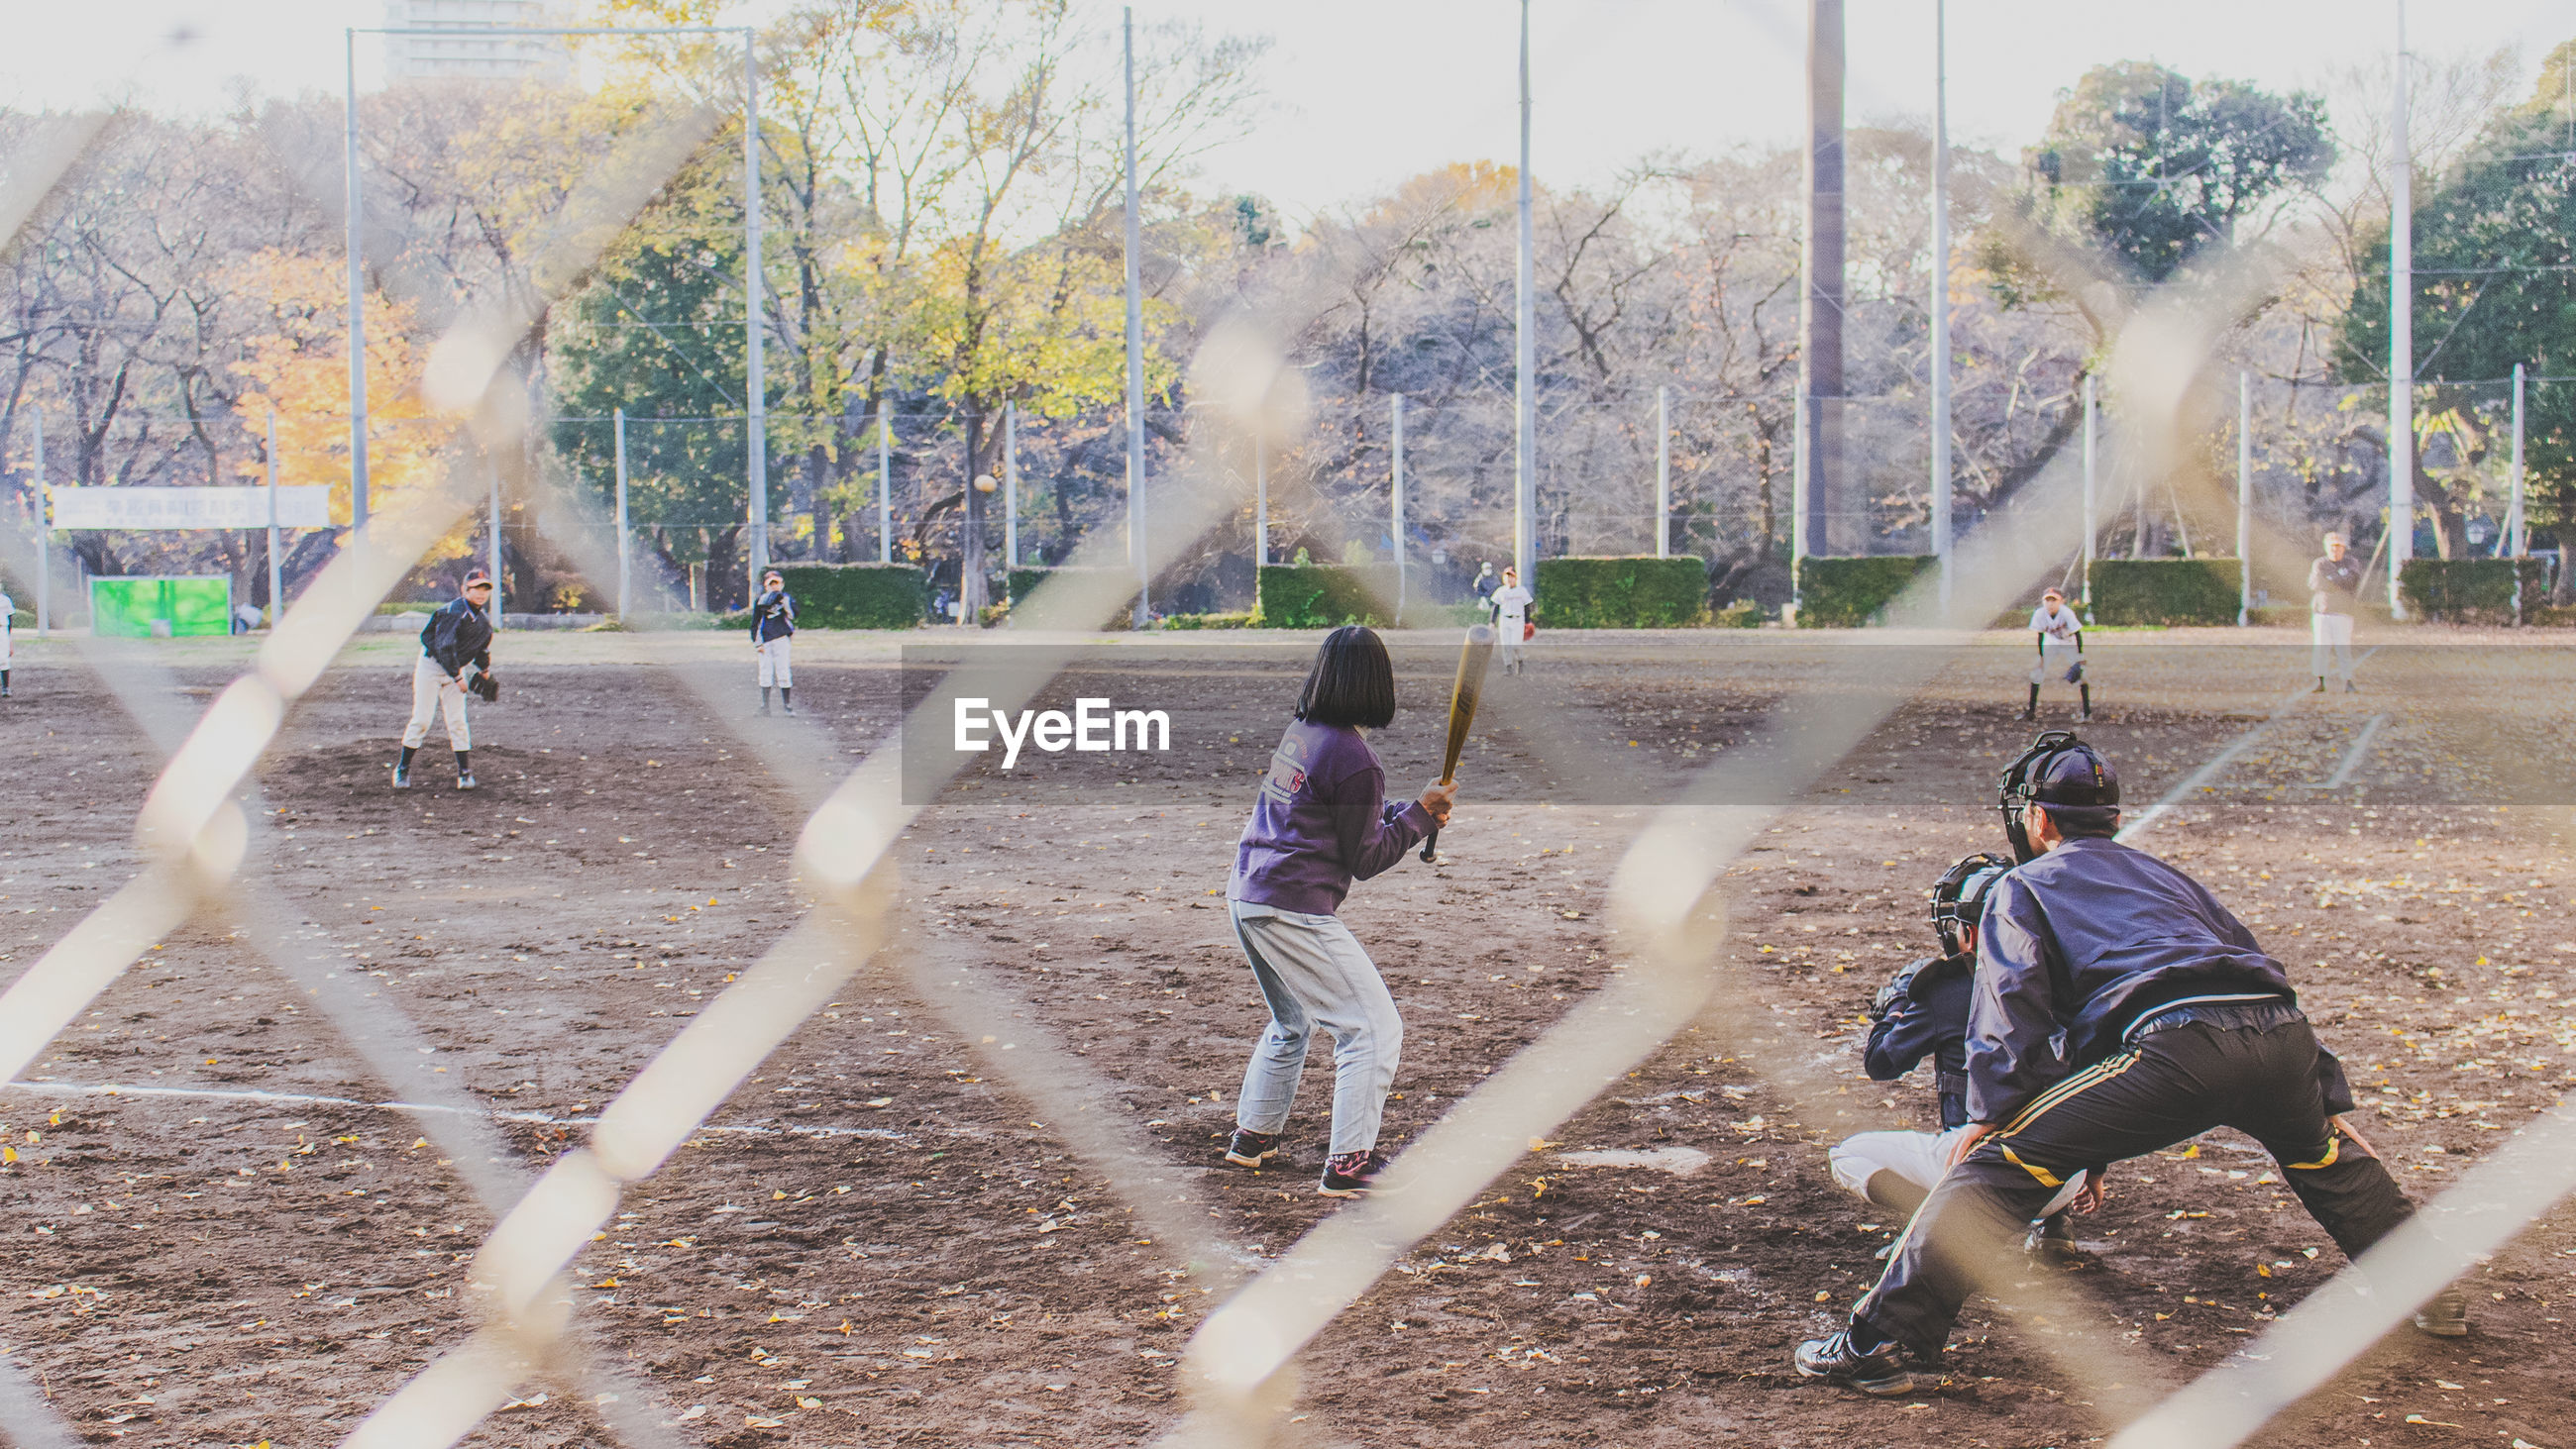 Group of kids practicing baseball